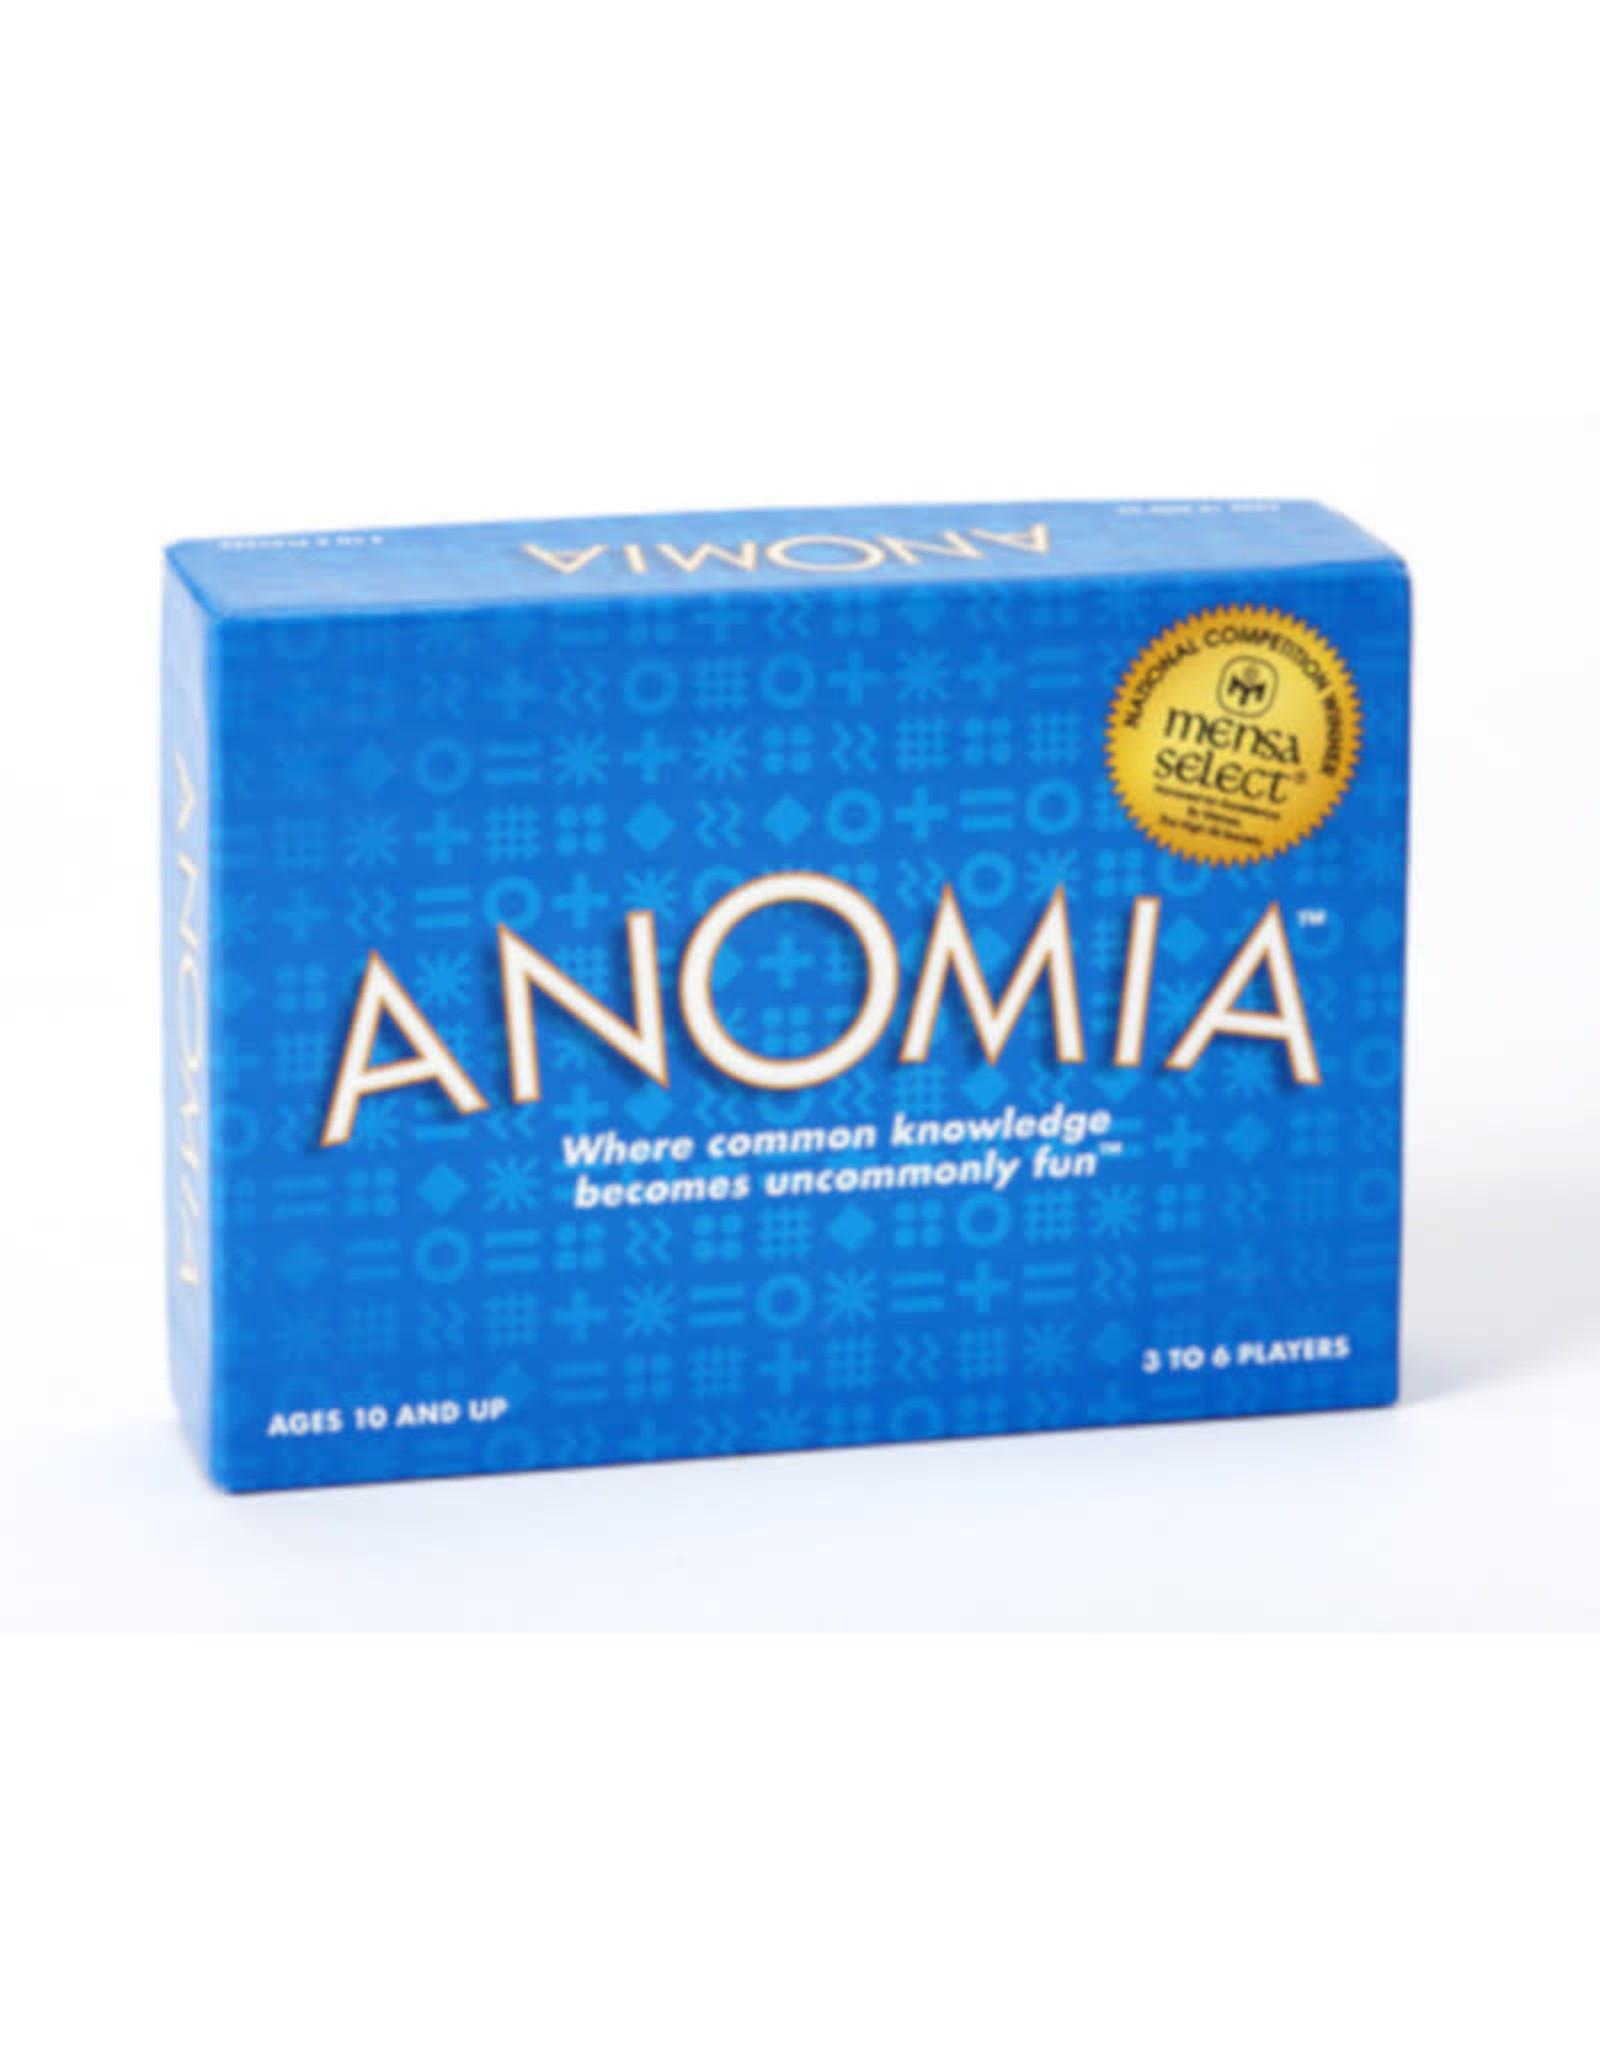 Bananagrams Anomia